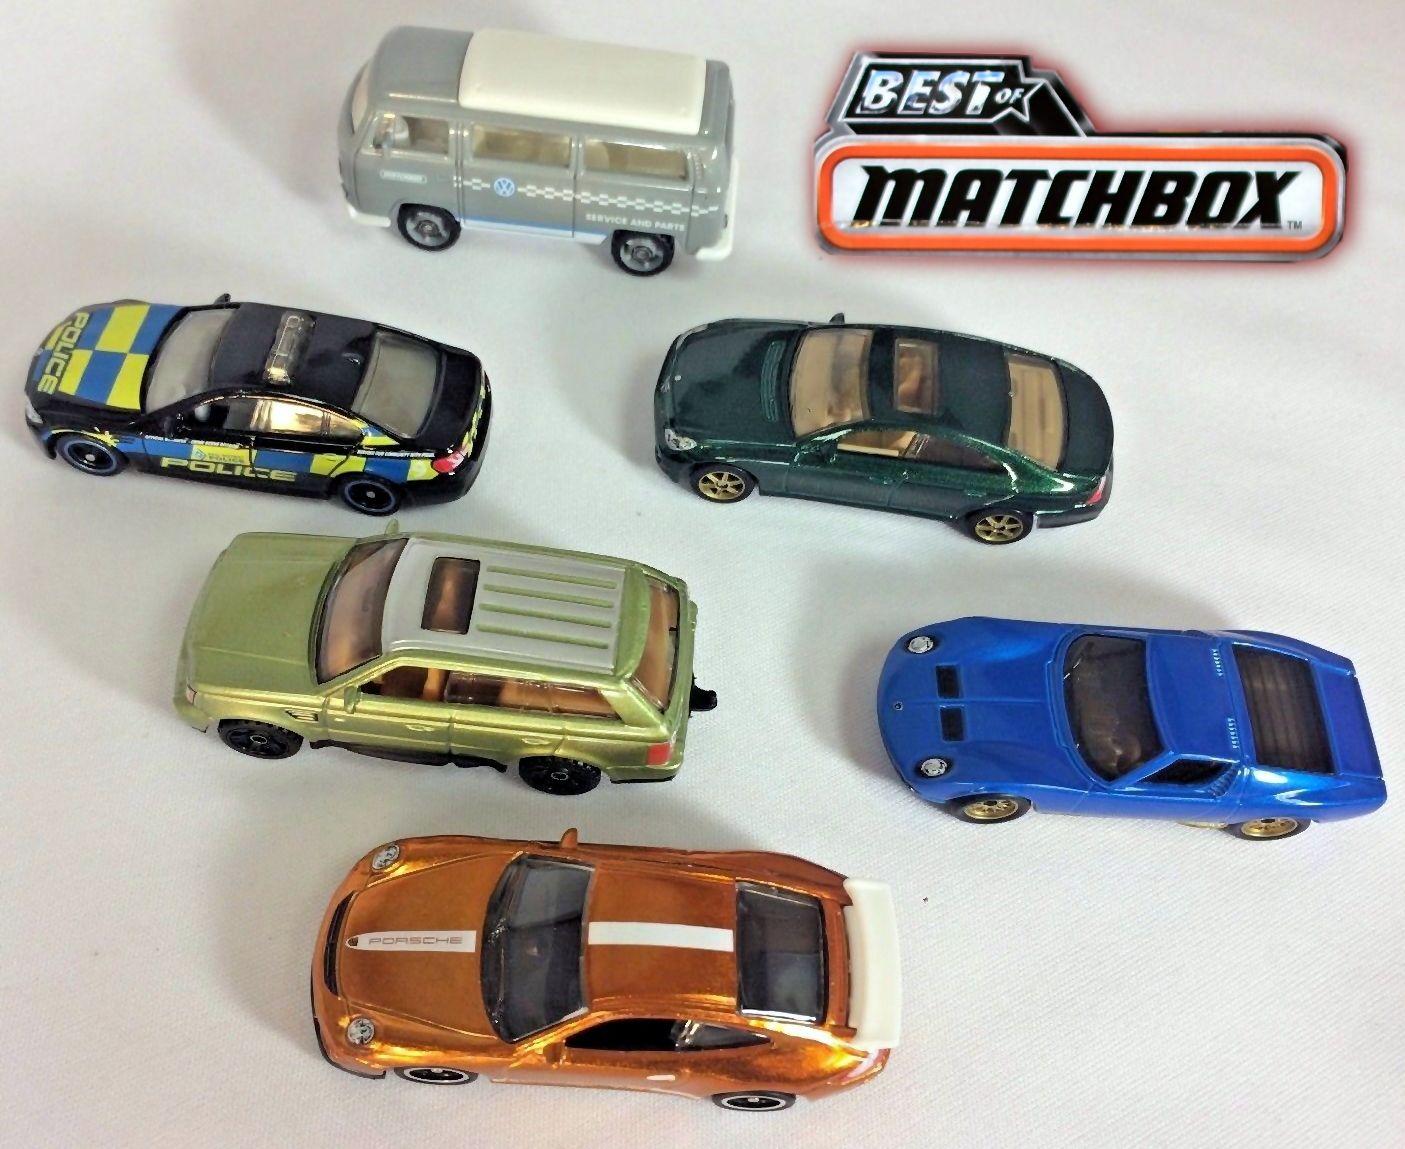 Best Of Matchbox 2017 Matchbox Cars Wiki Fandom Powered By Wikia